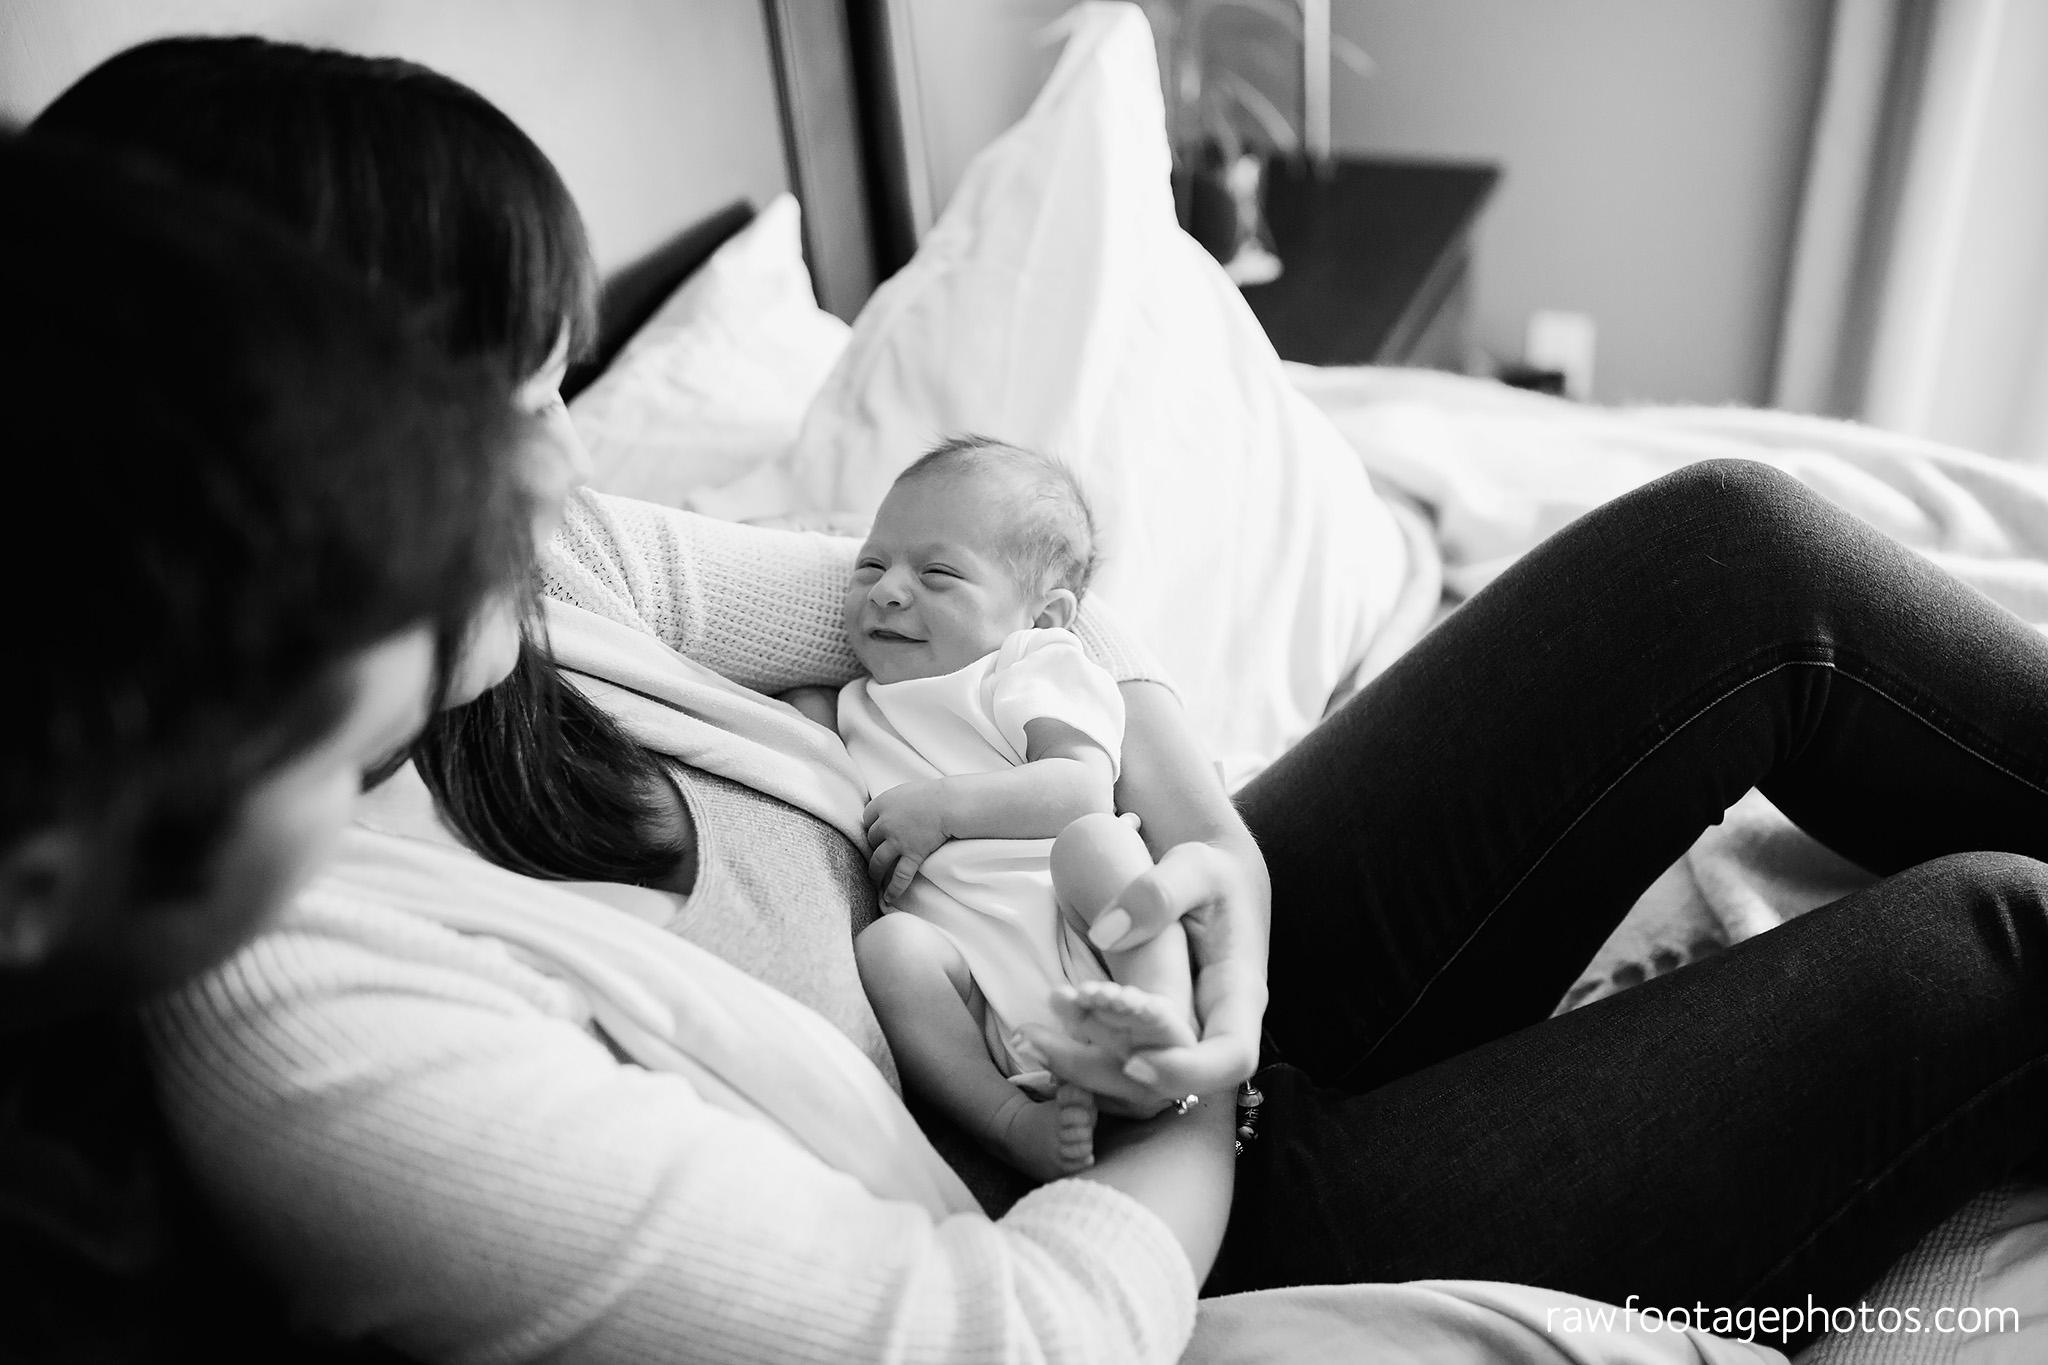 london_ontario_newborn_photographer-newborn_lifestyle_photography-baby_boy-raw_footage_photography001.jpg